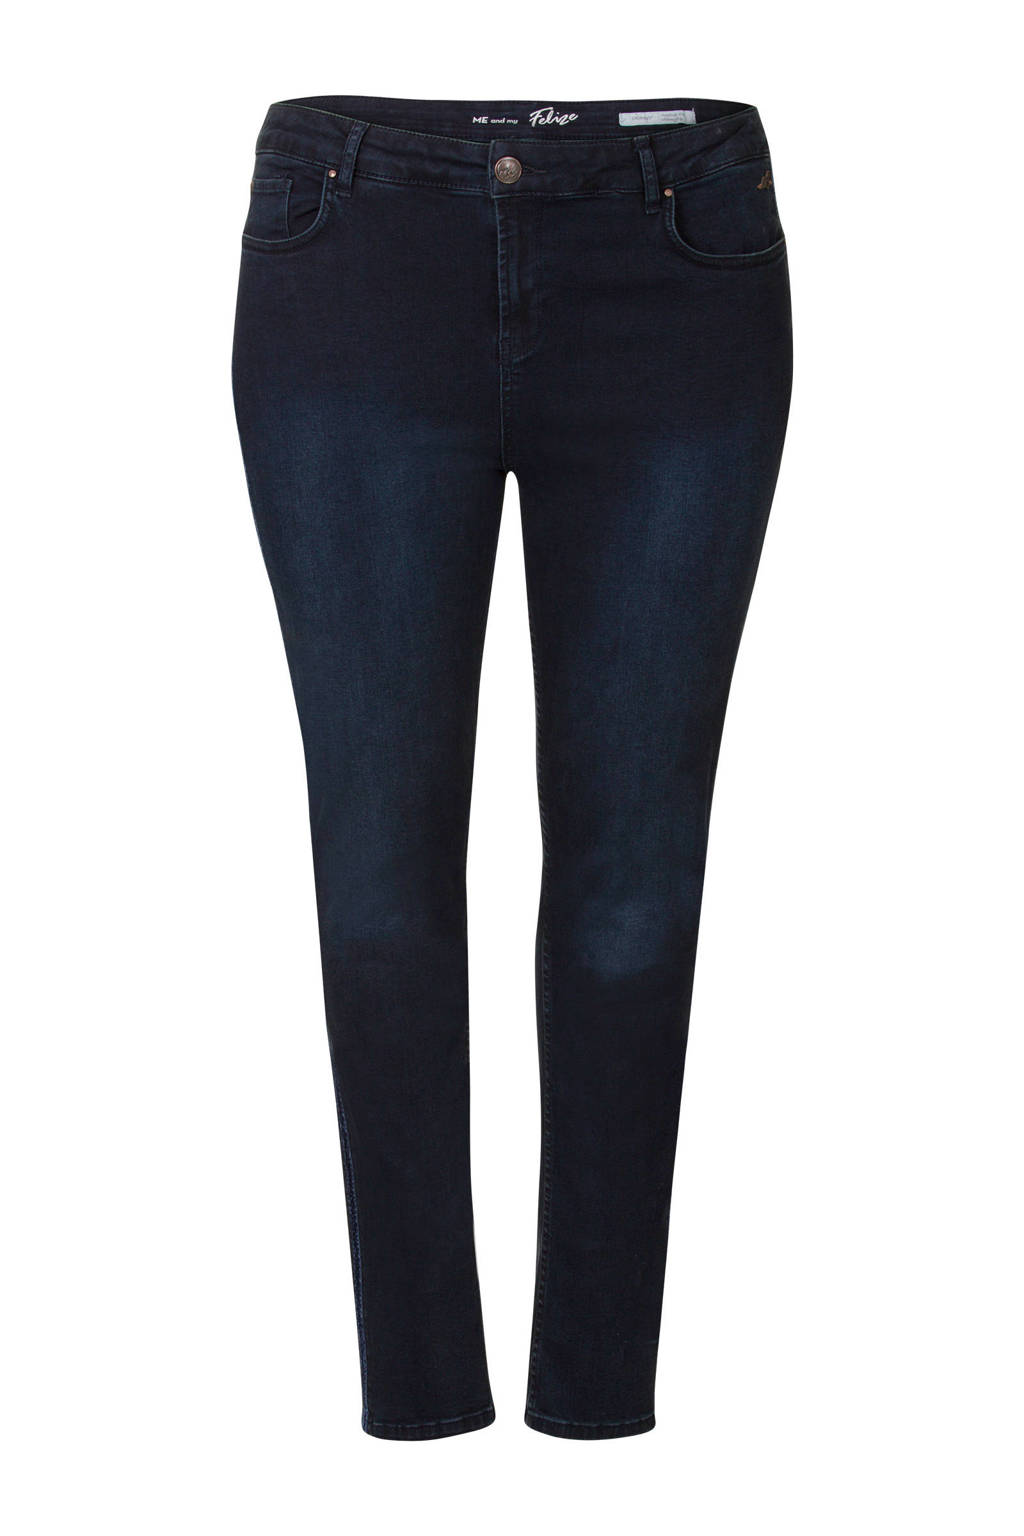 Miss Etam Plus skinny jeans donkerblauw, Donkerblauw